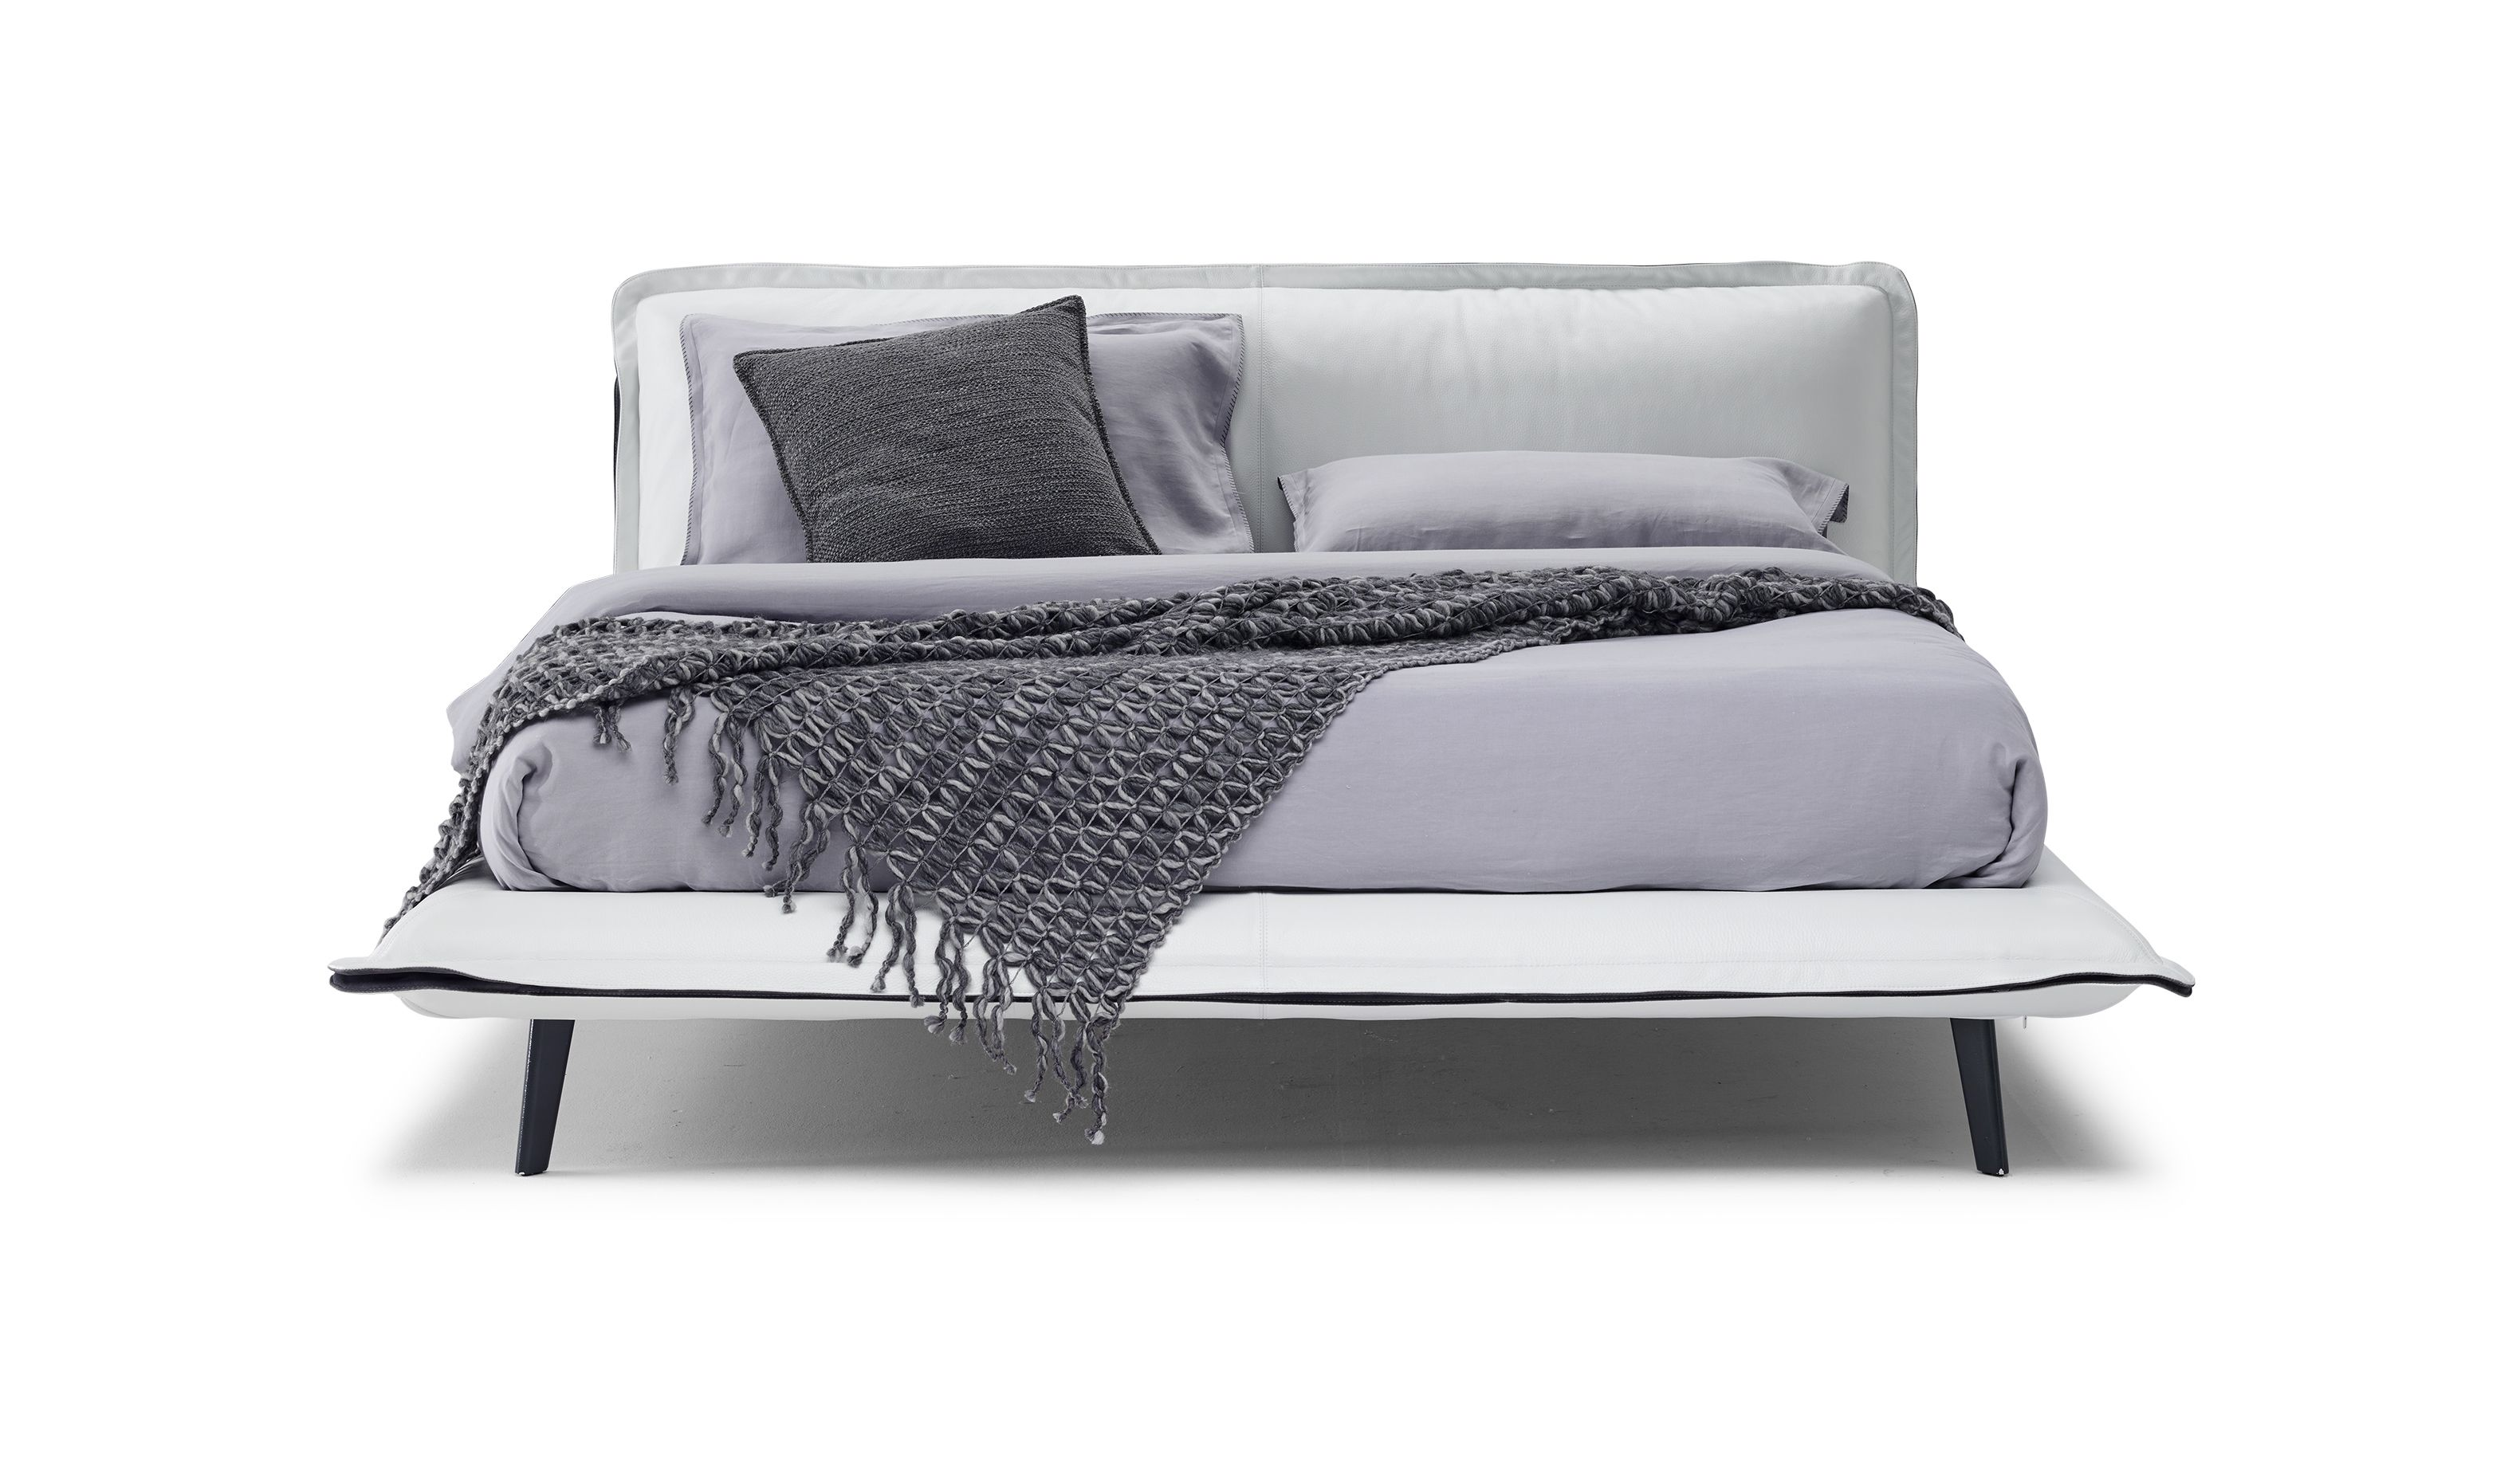 Natuzzi Bedroom Furniture Piuma Bed By Natuzzi Italia Natuzzi Italia Pinterest Beds